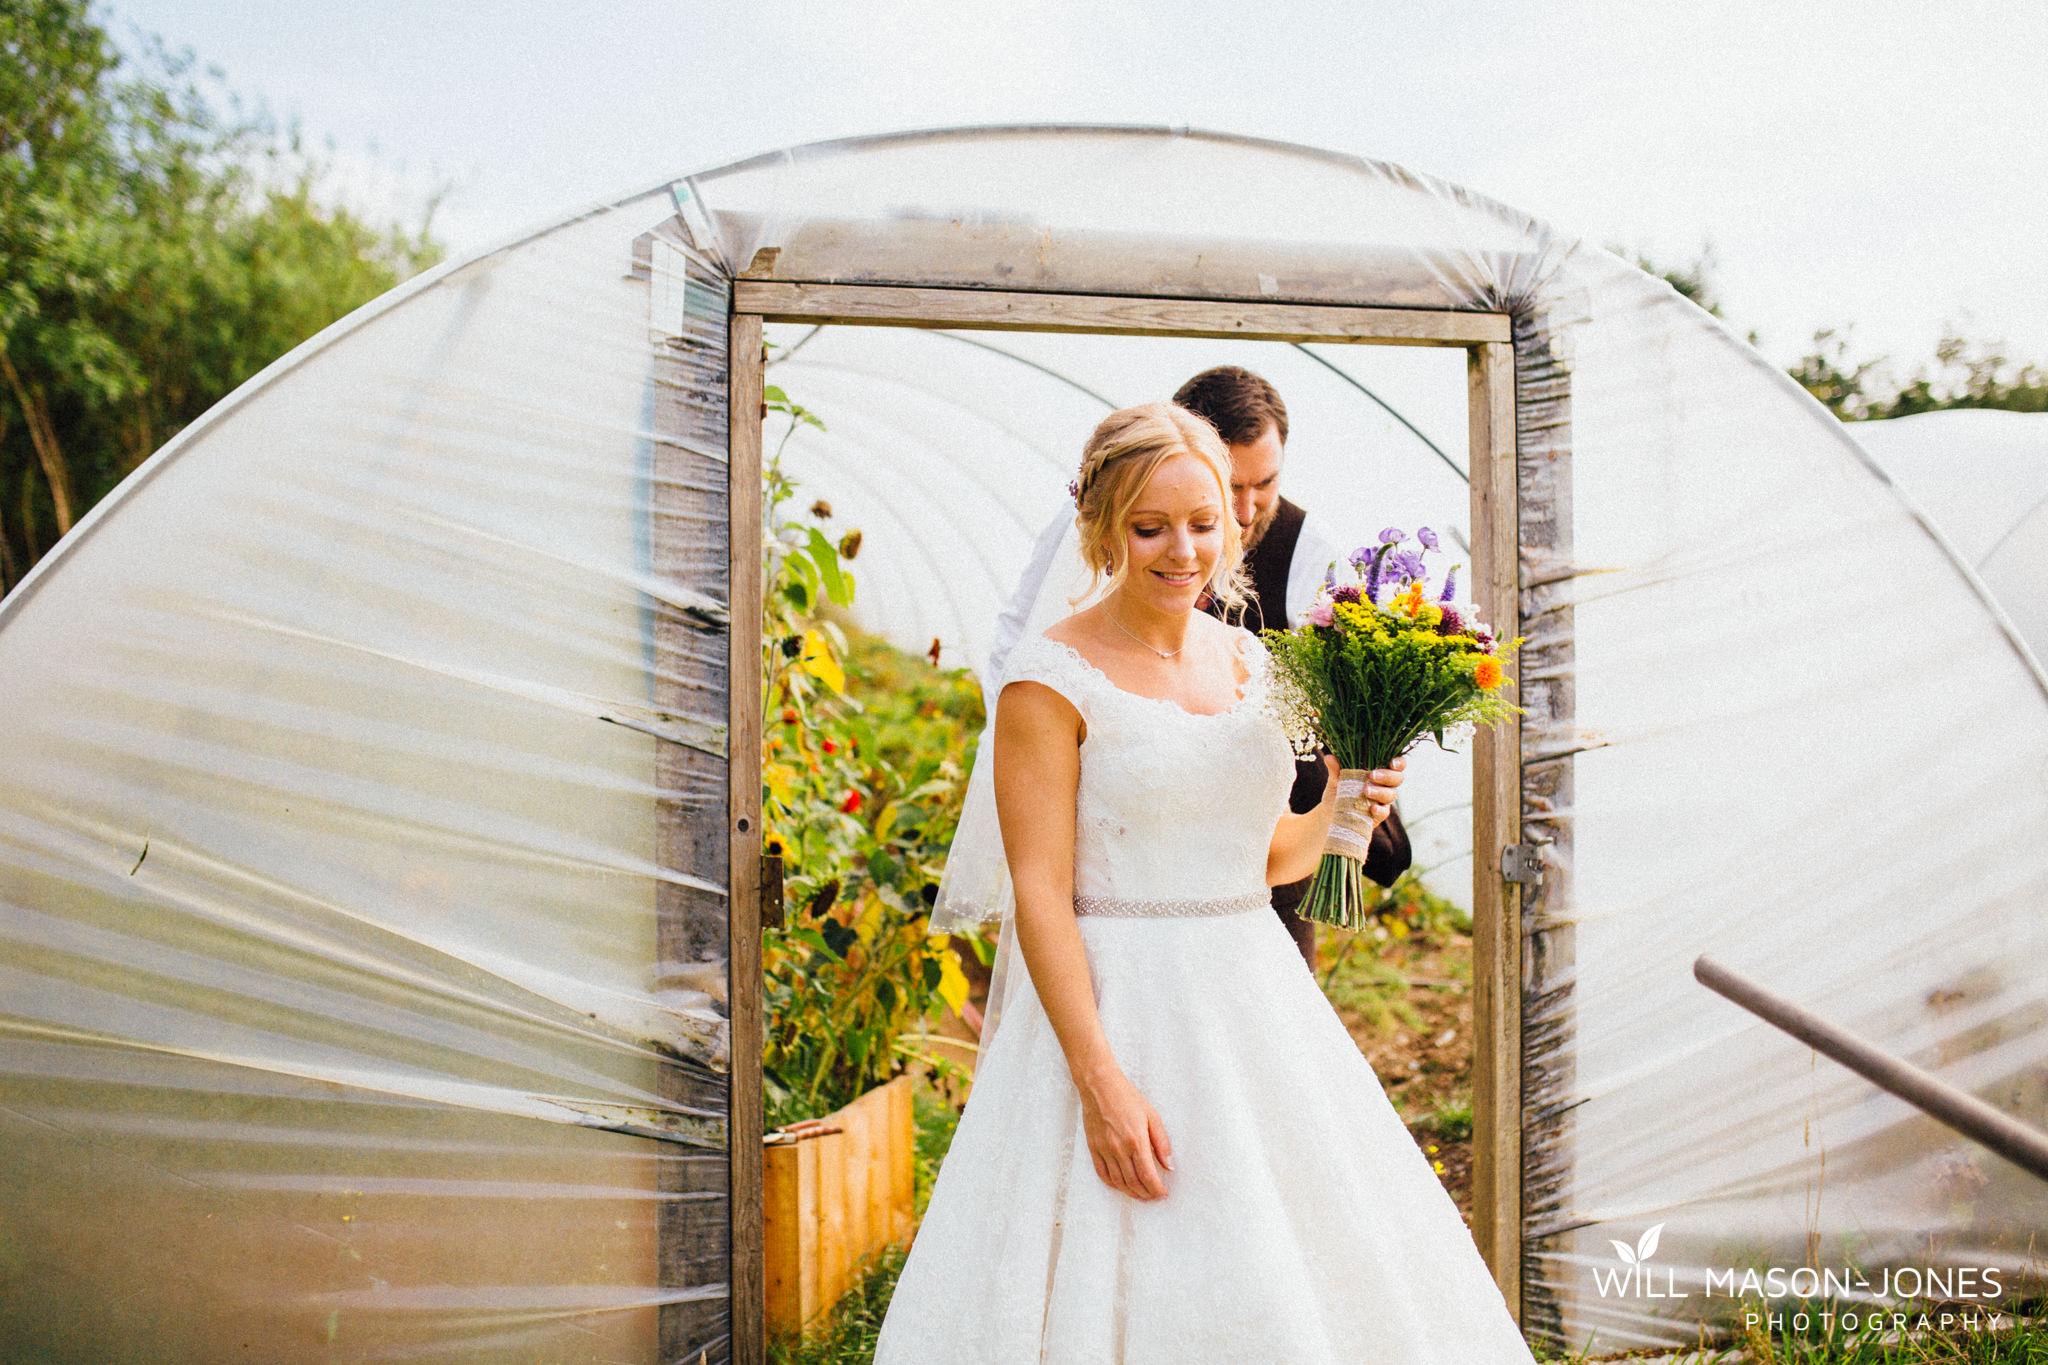 pen y banc farm couple portraits tipi wedding photography